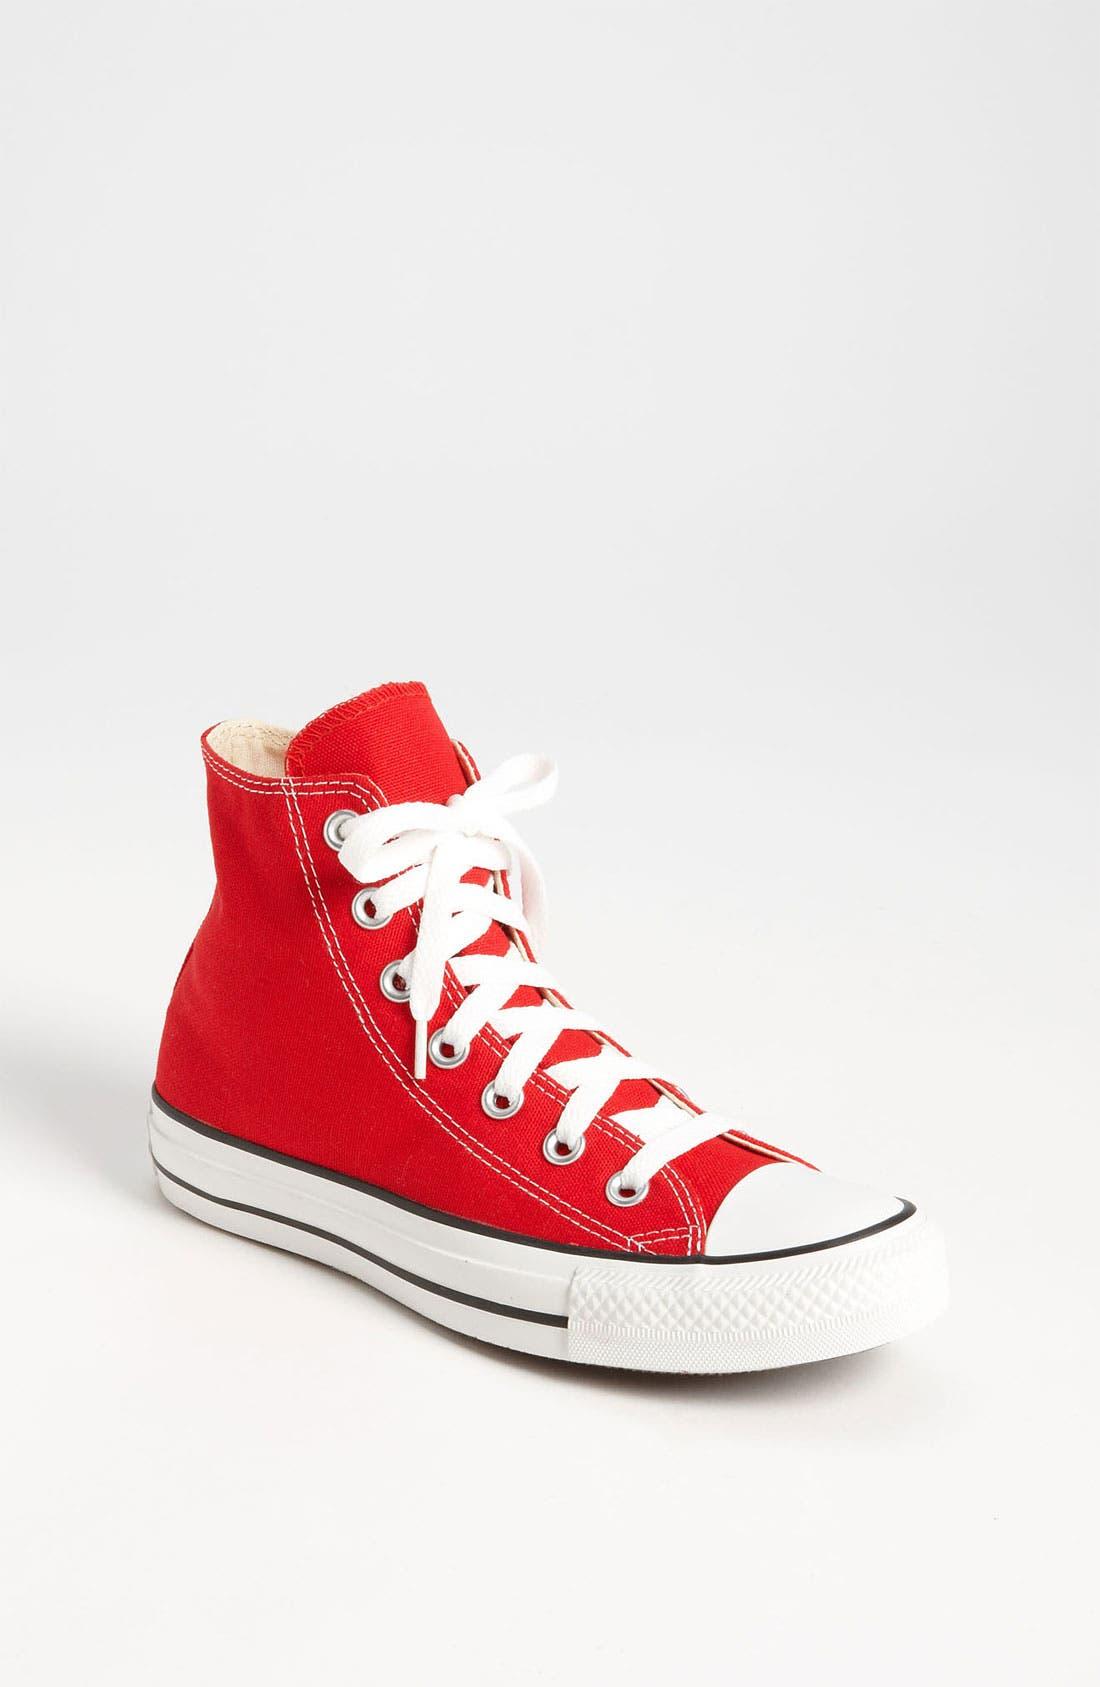 Chuck Taylor<sup>®</sup> High Top Sneaker,                             Main thumbnail 1, color,                             600